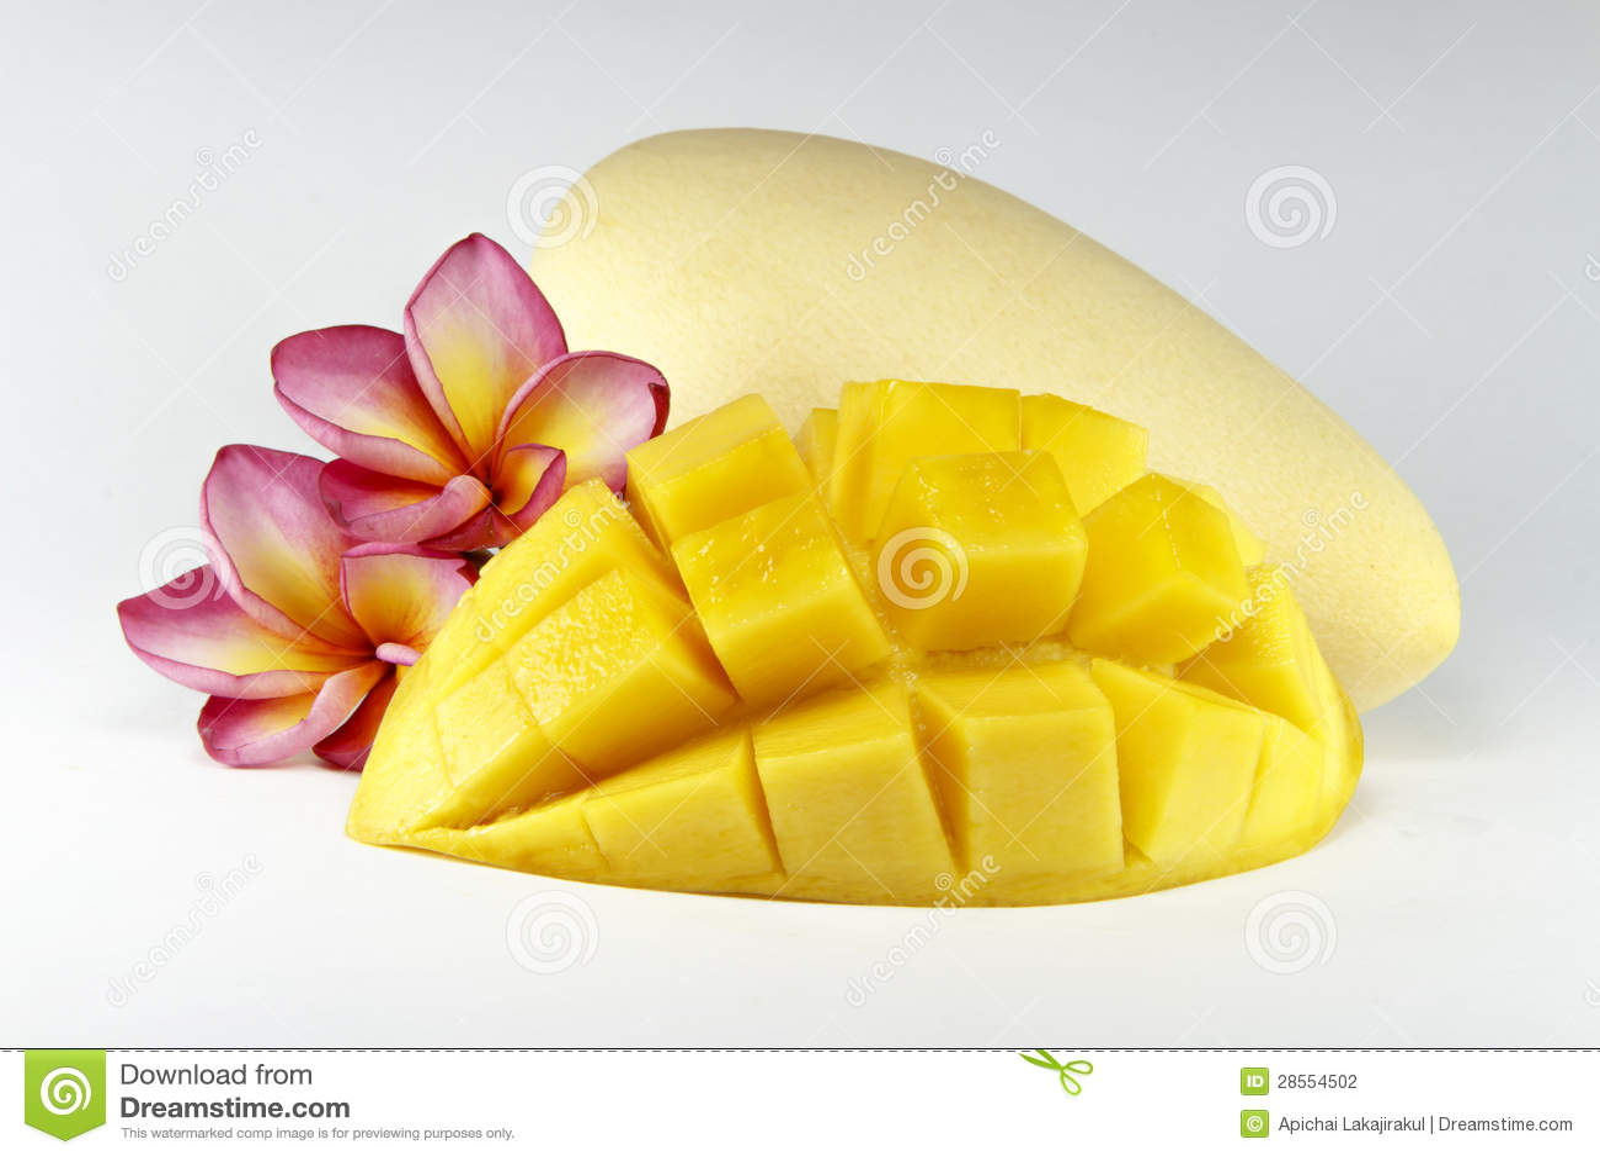 Mango orchard business plan